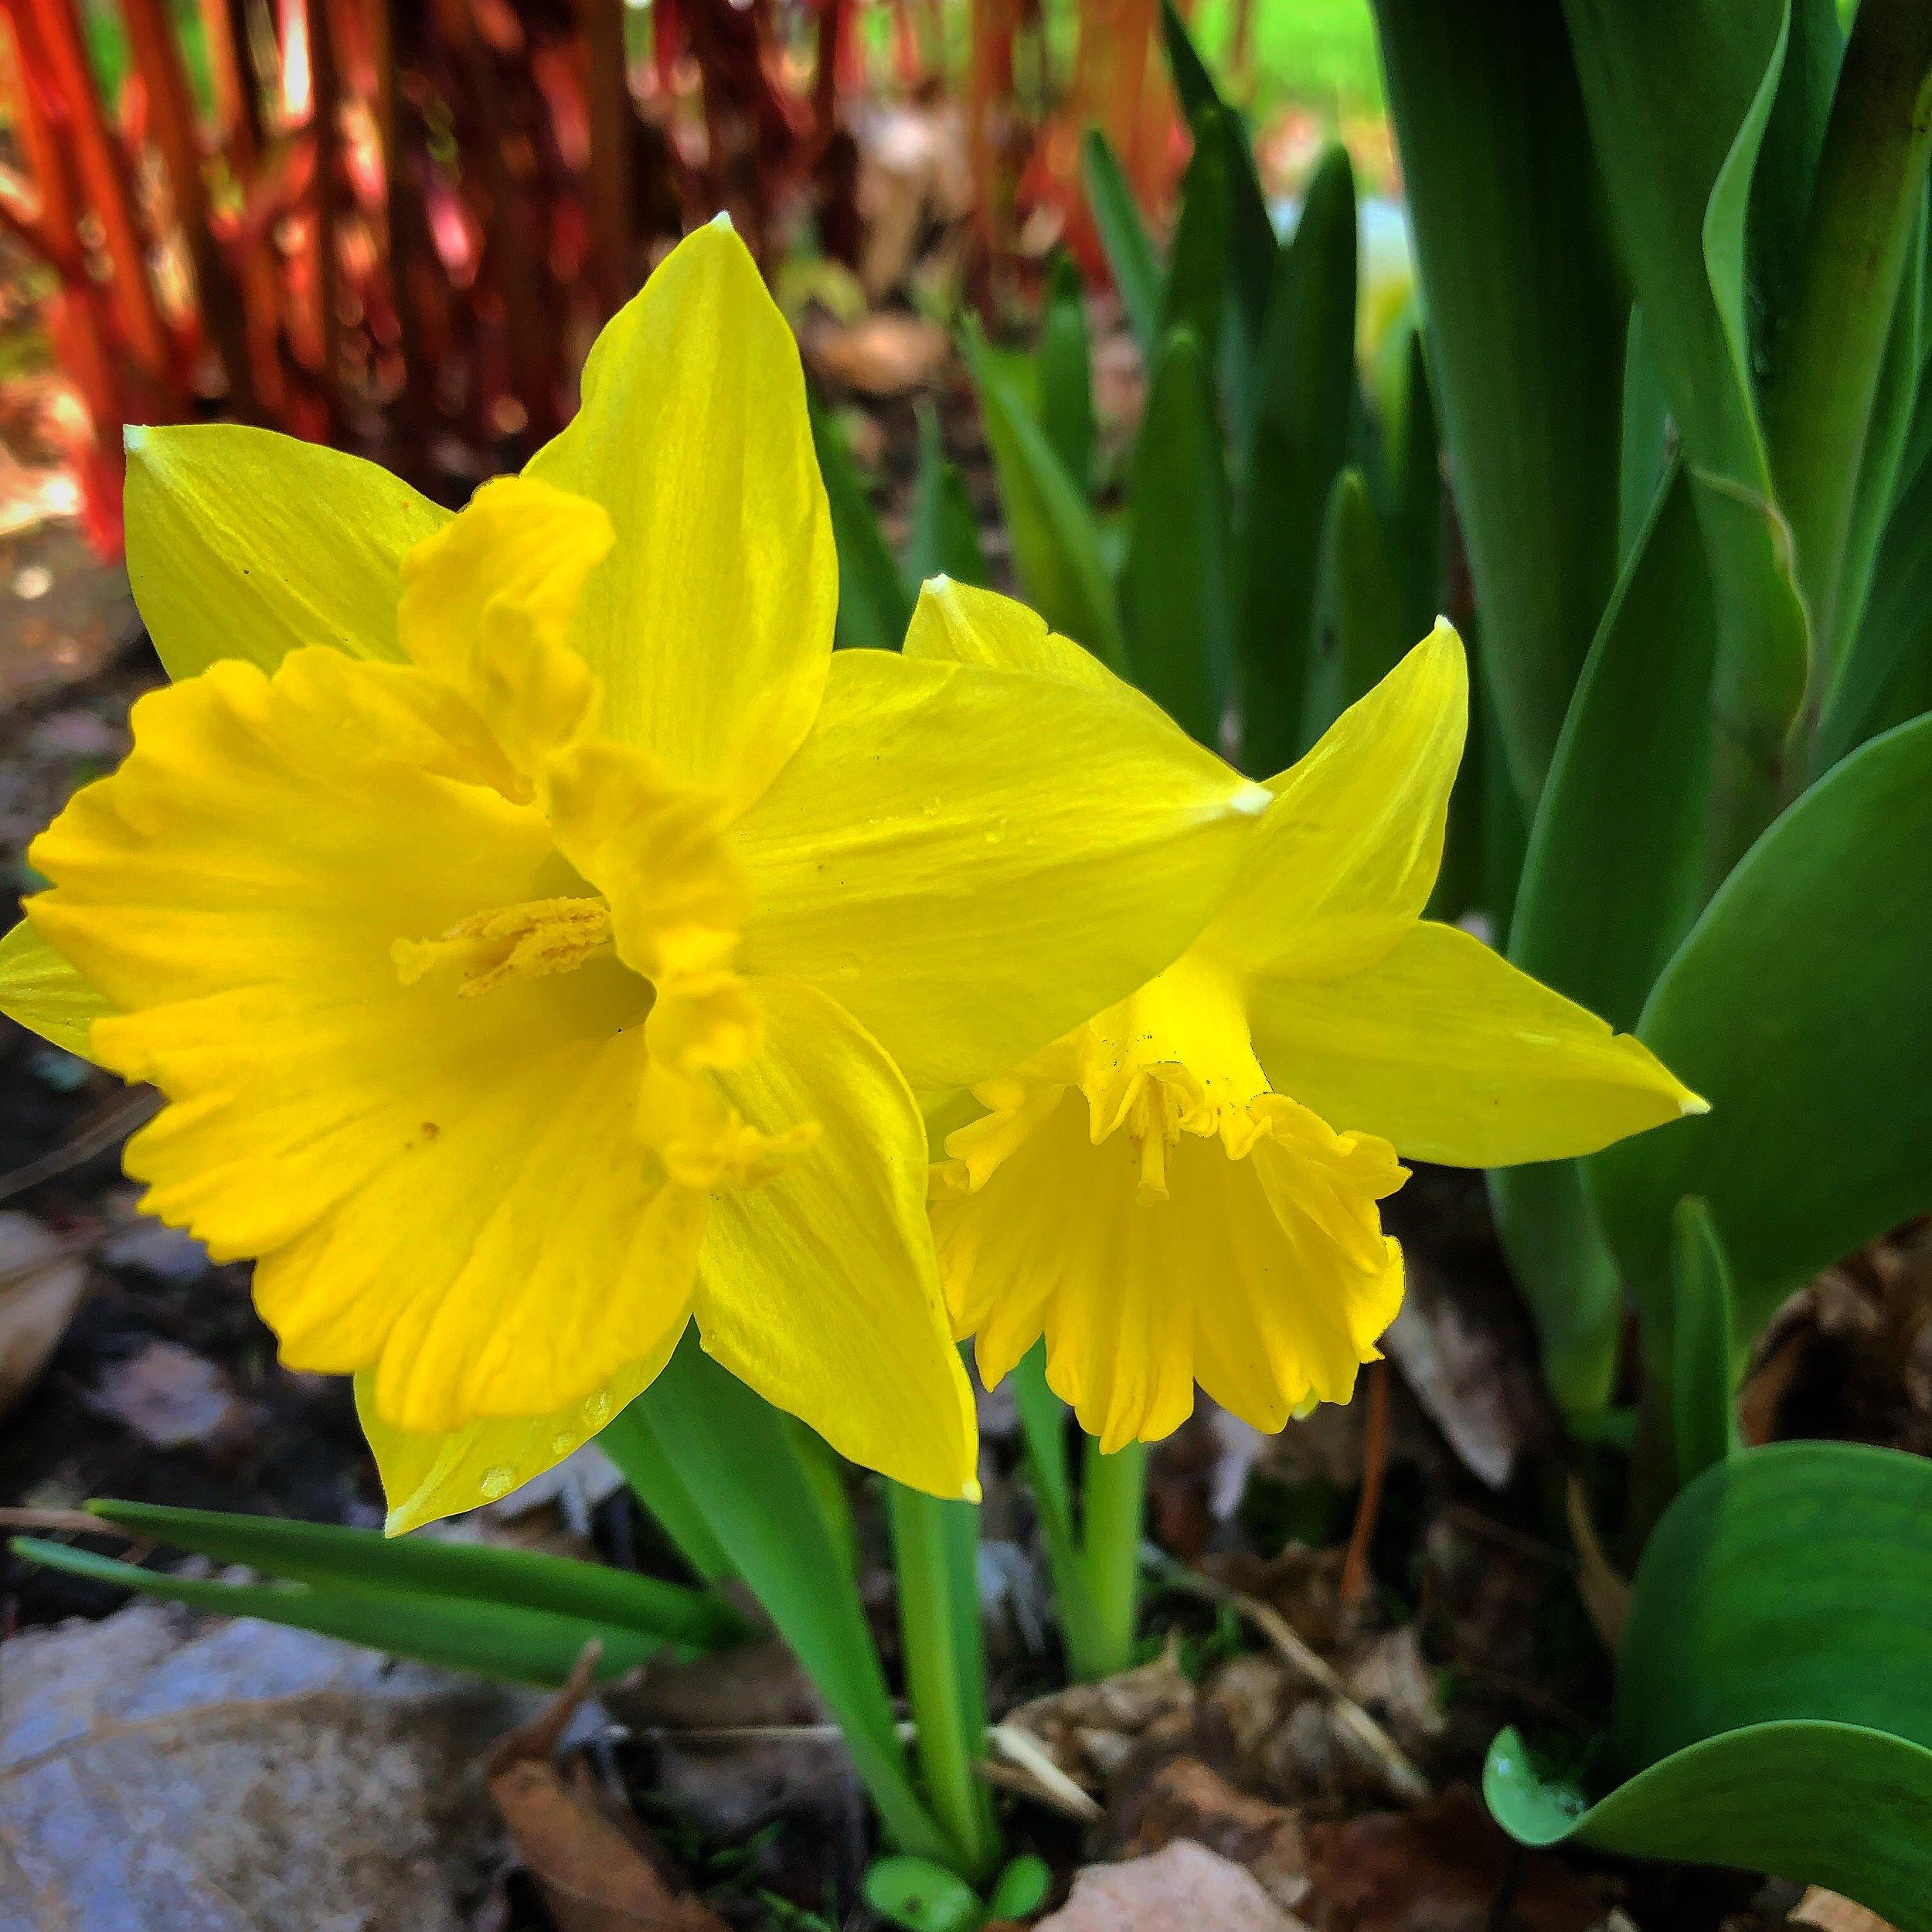 Gorgeous daffodils!